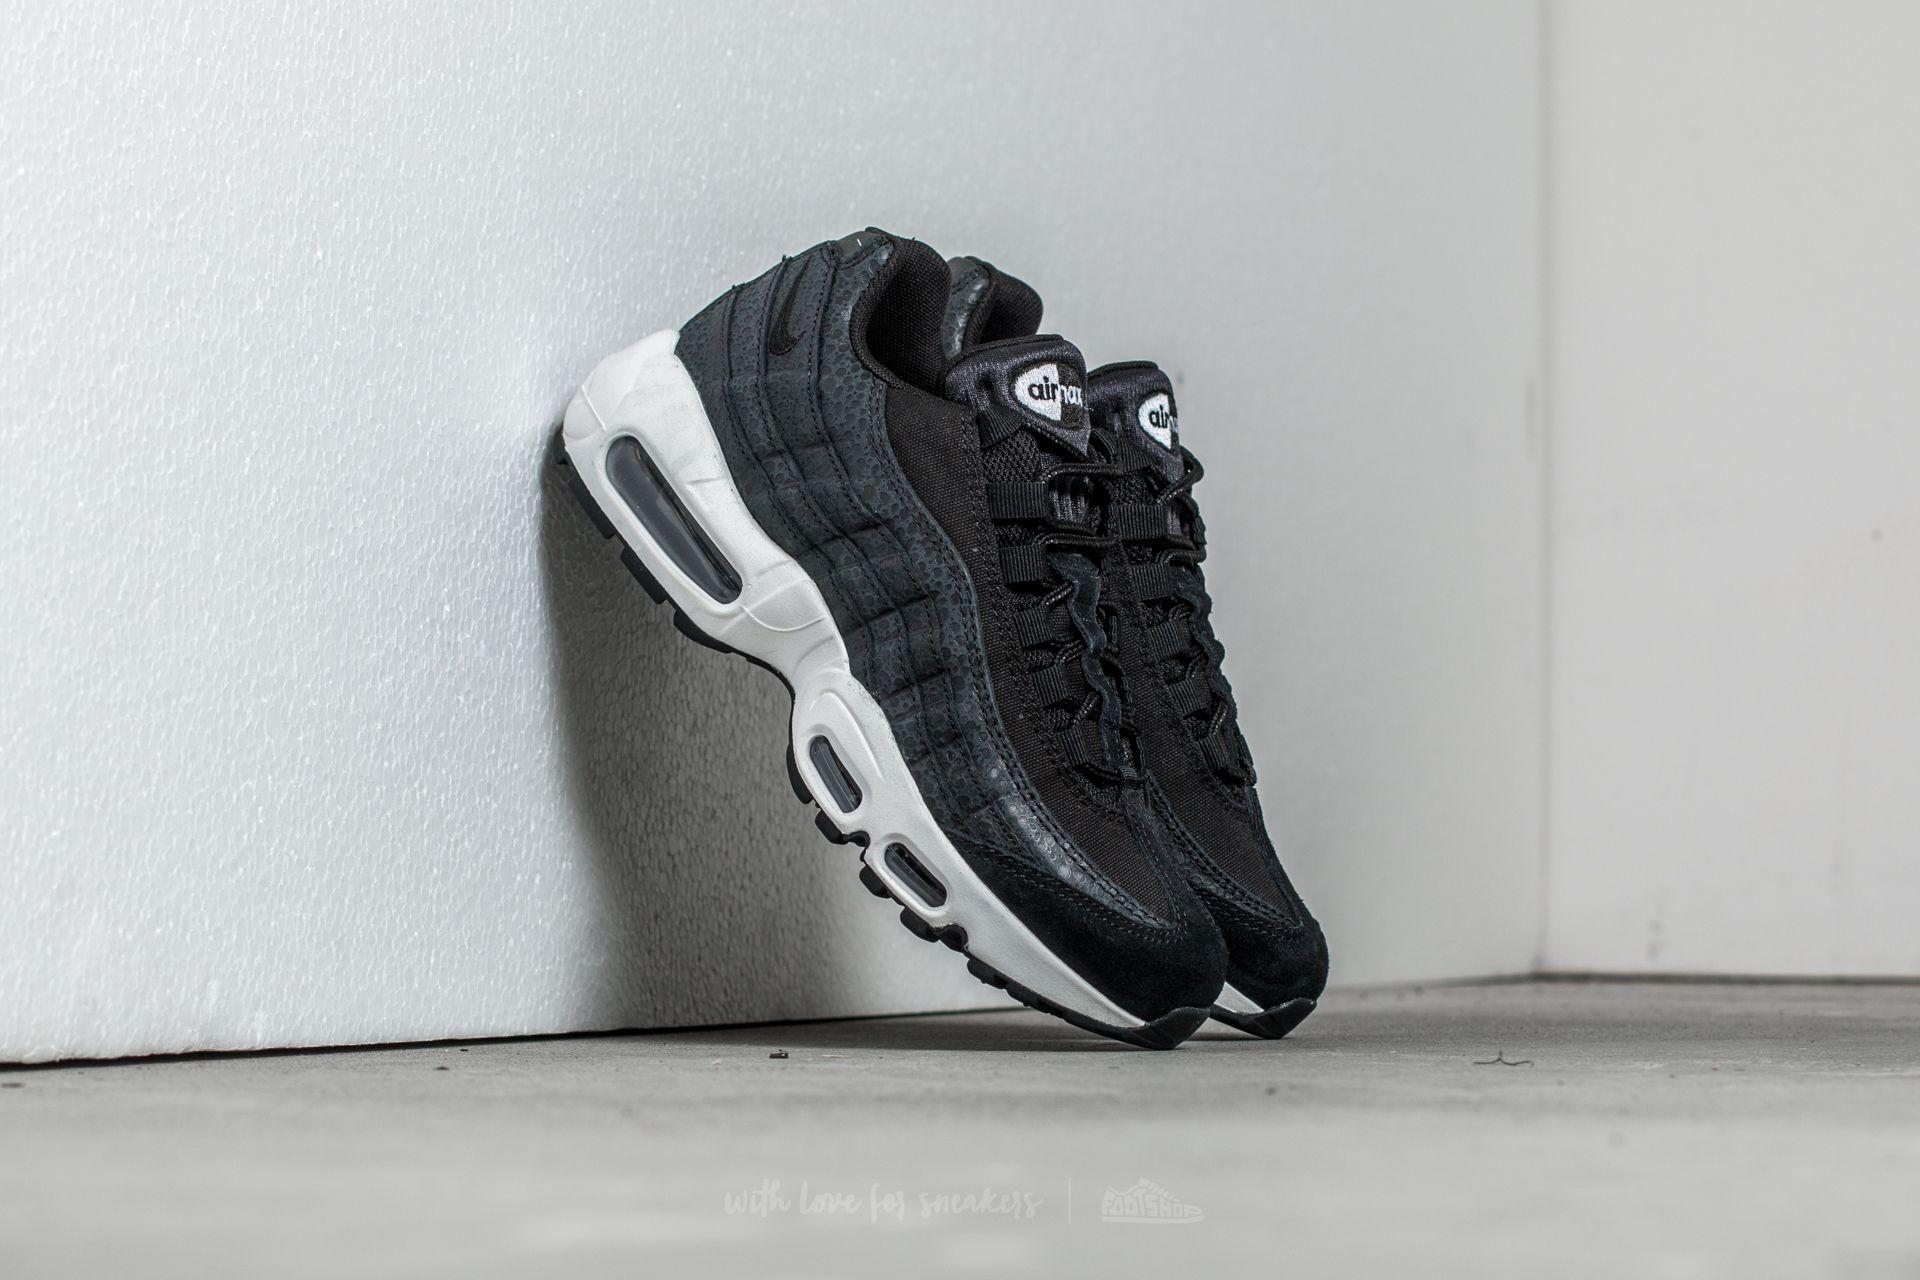 Nike Wmns Air Max 95 Premium Black Summit White | Footshop